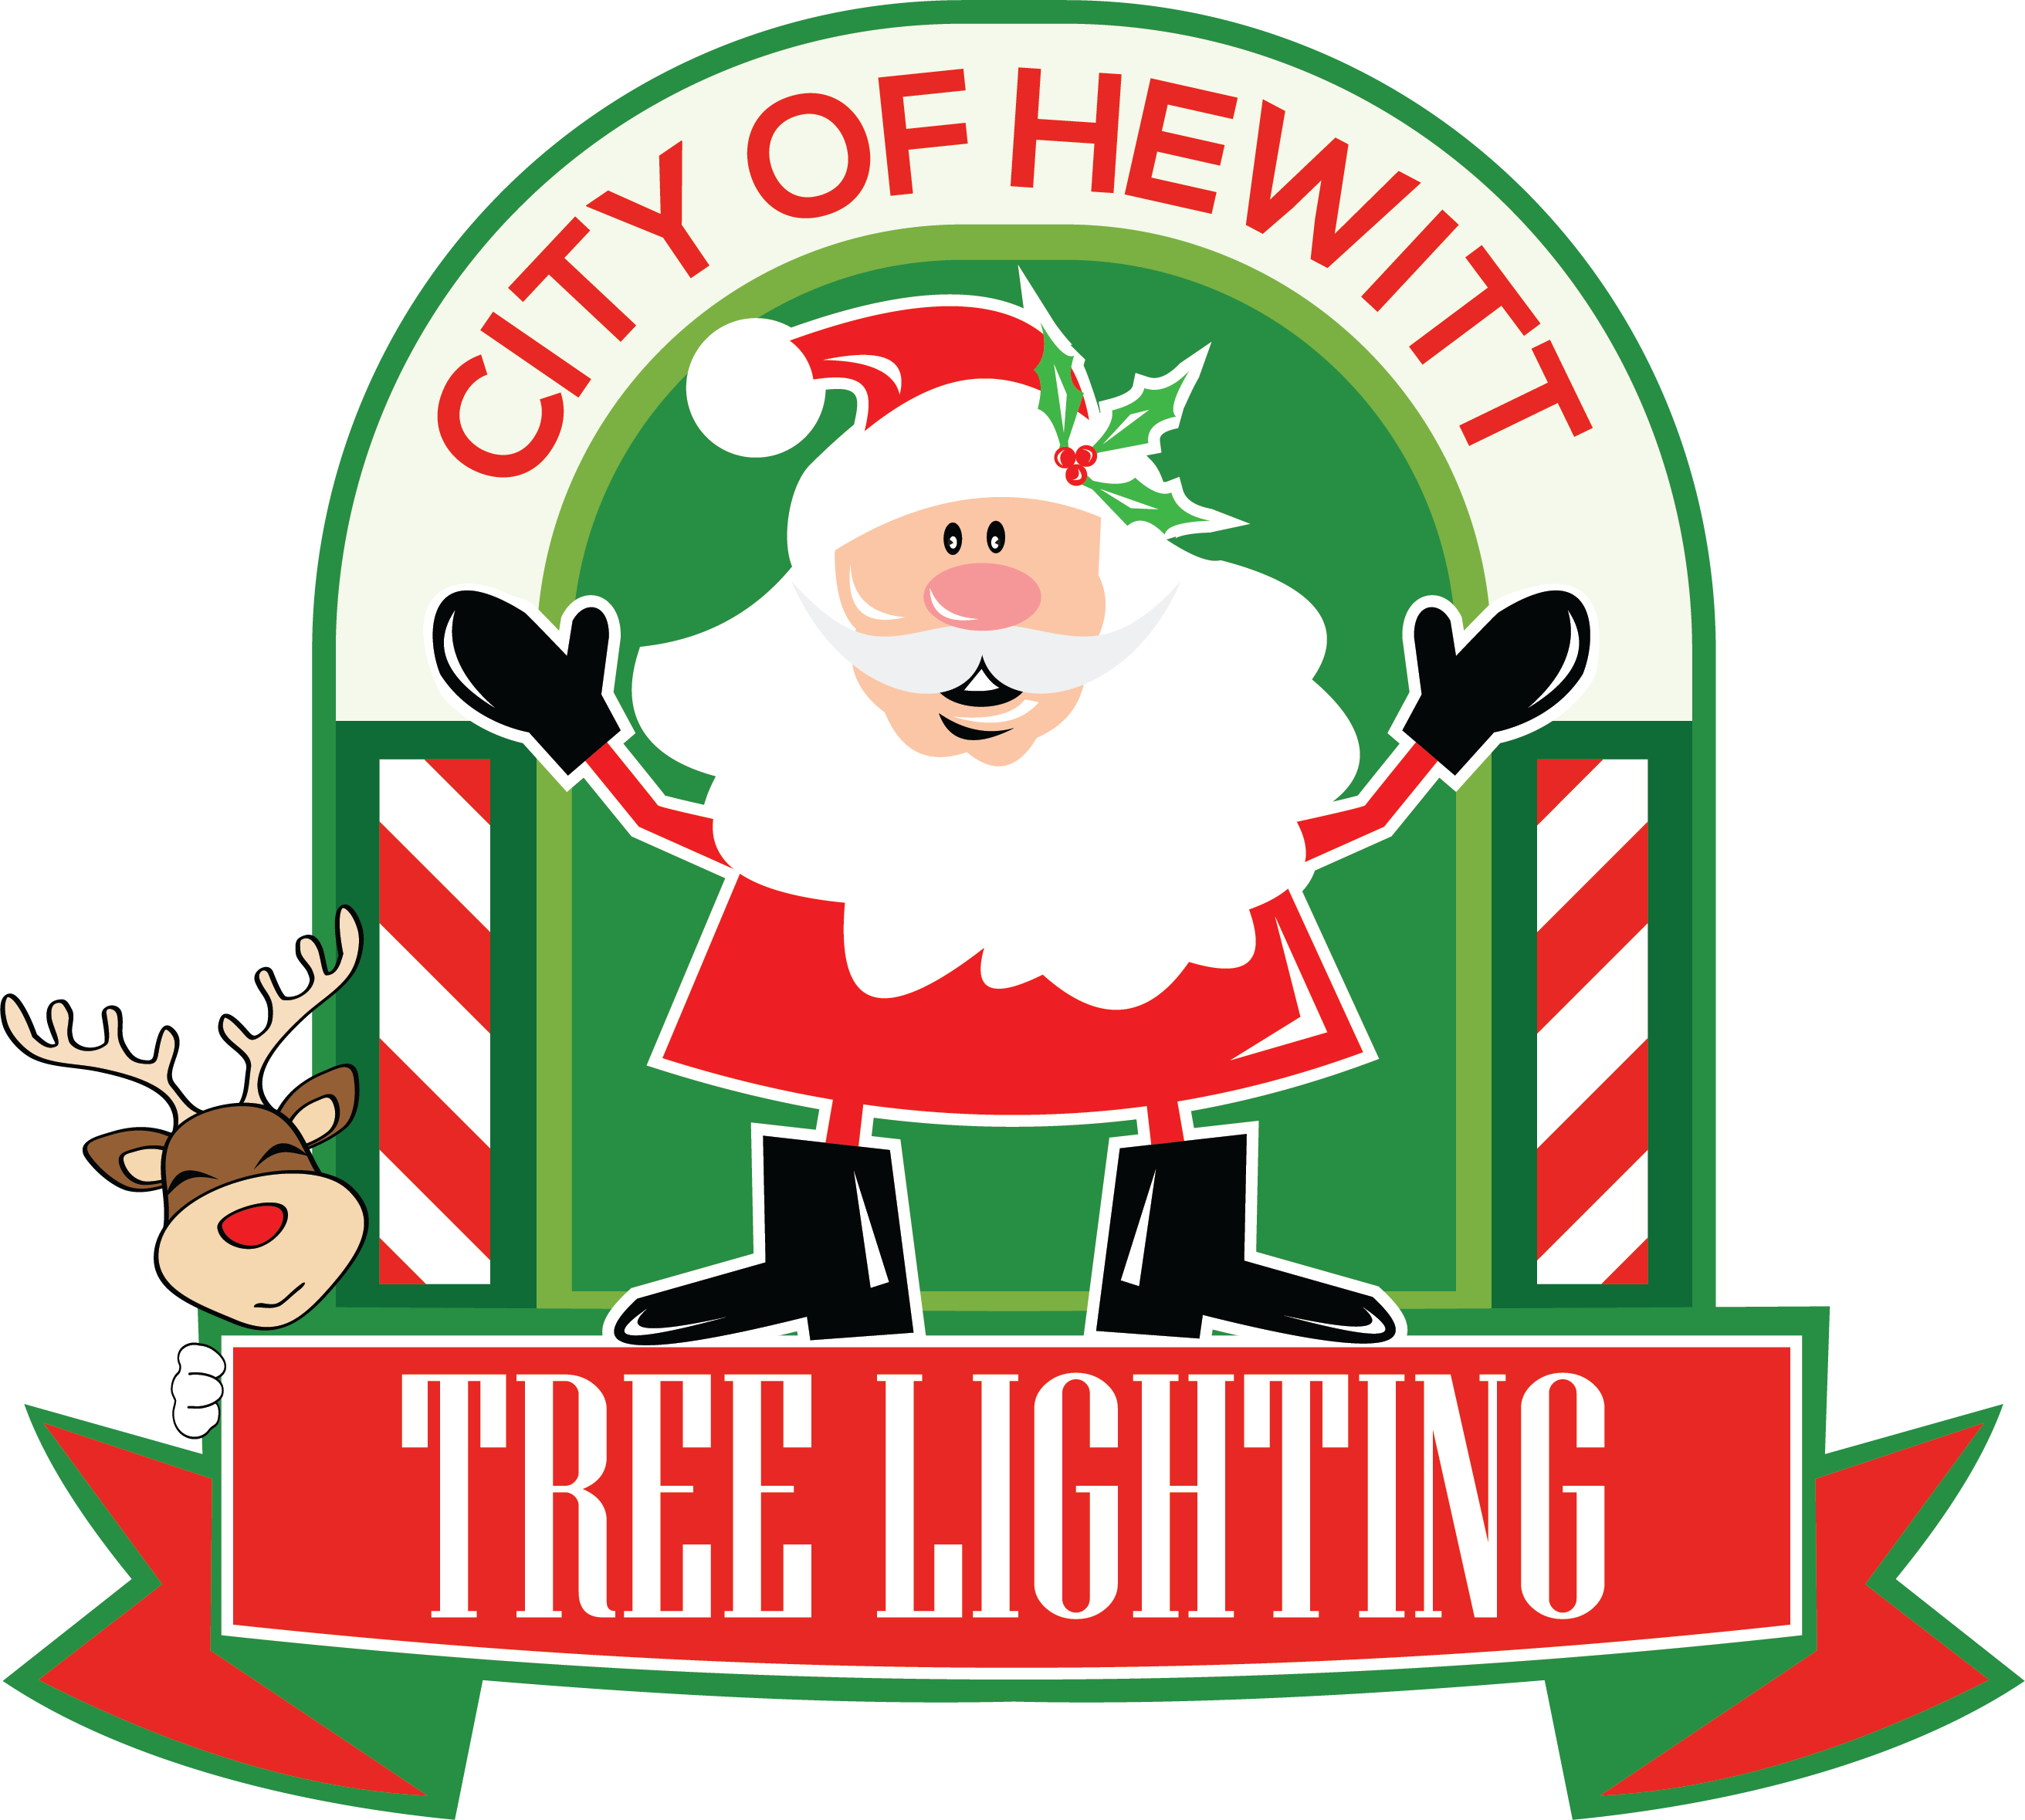 Christmas Tree Lighting - Greater Hewitt Chamber of Commerce